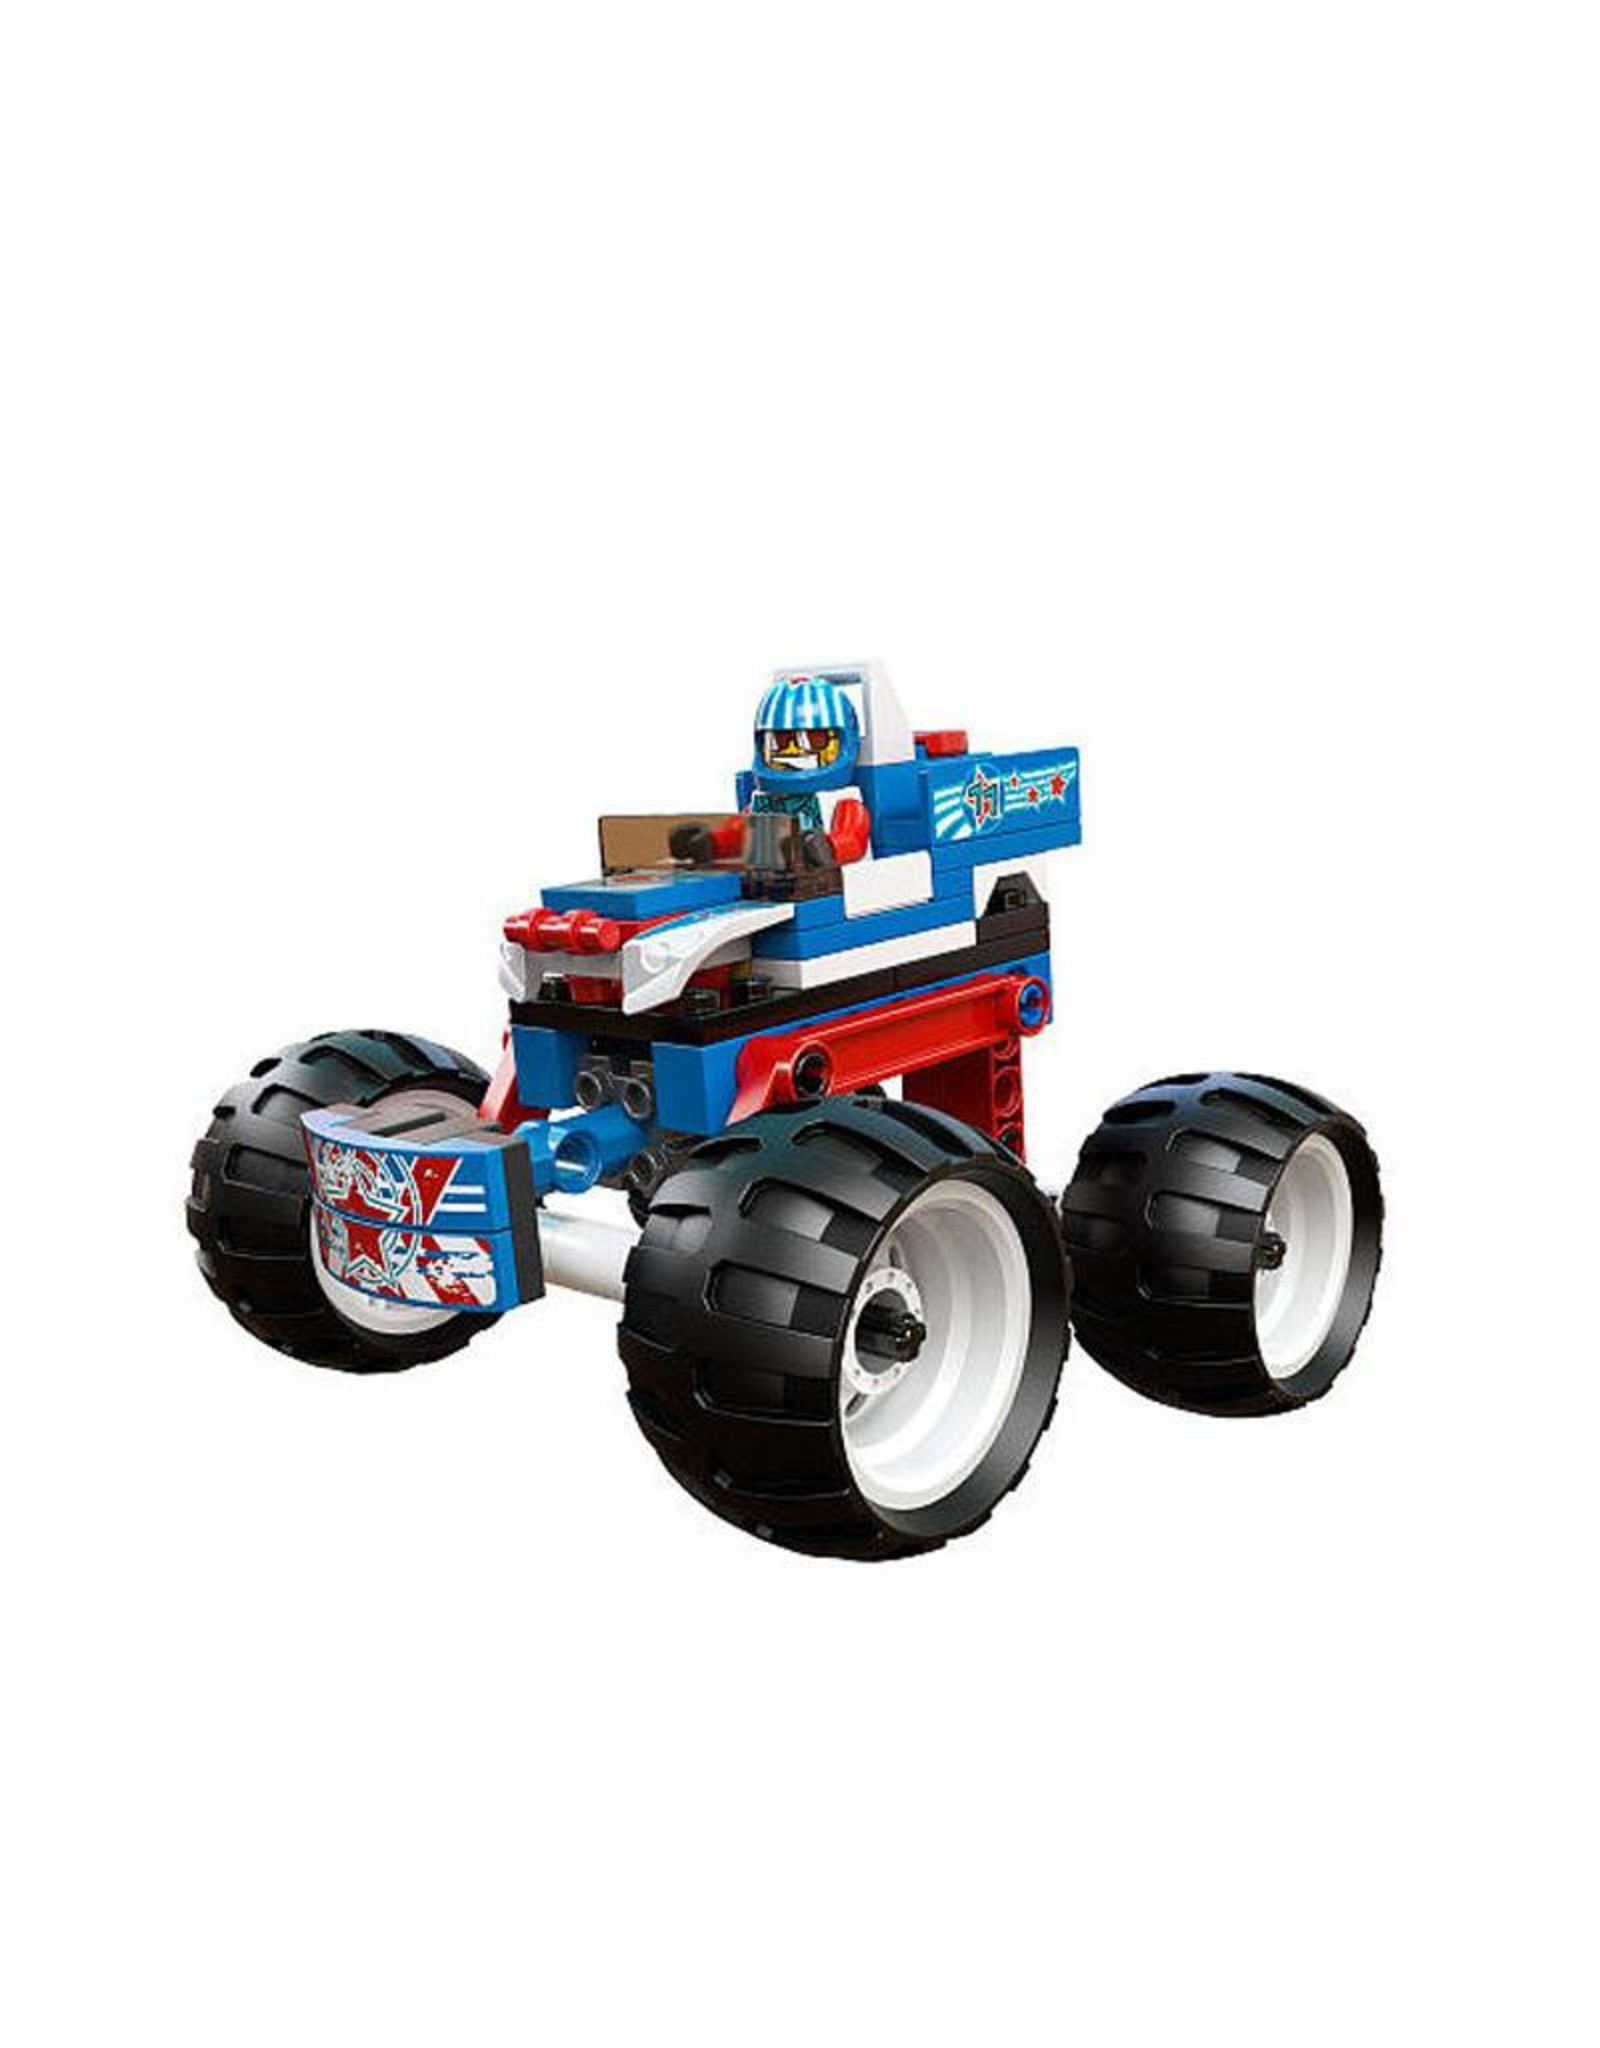 LEGO LEGO 9094 Star Striker RACERS